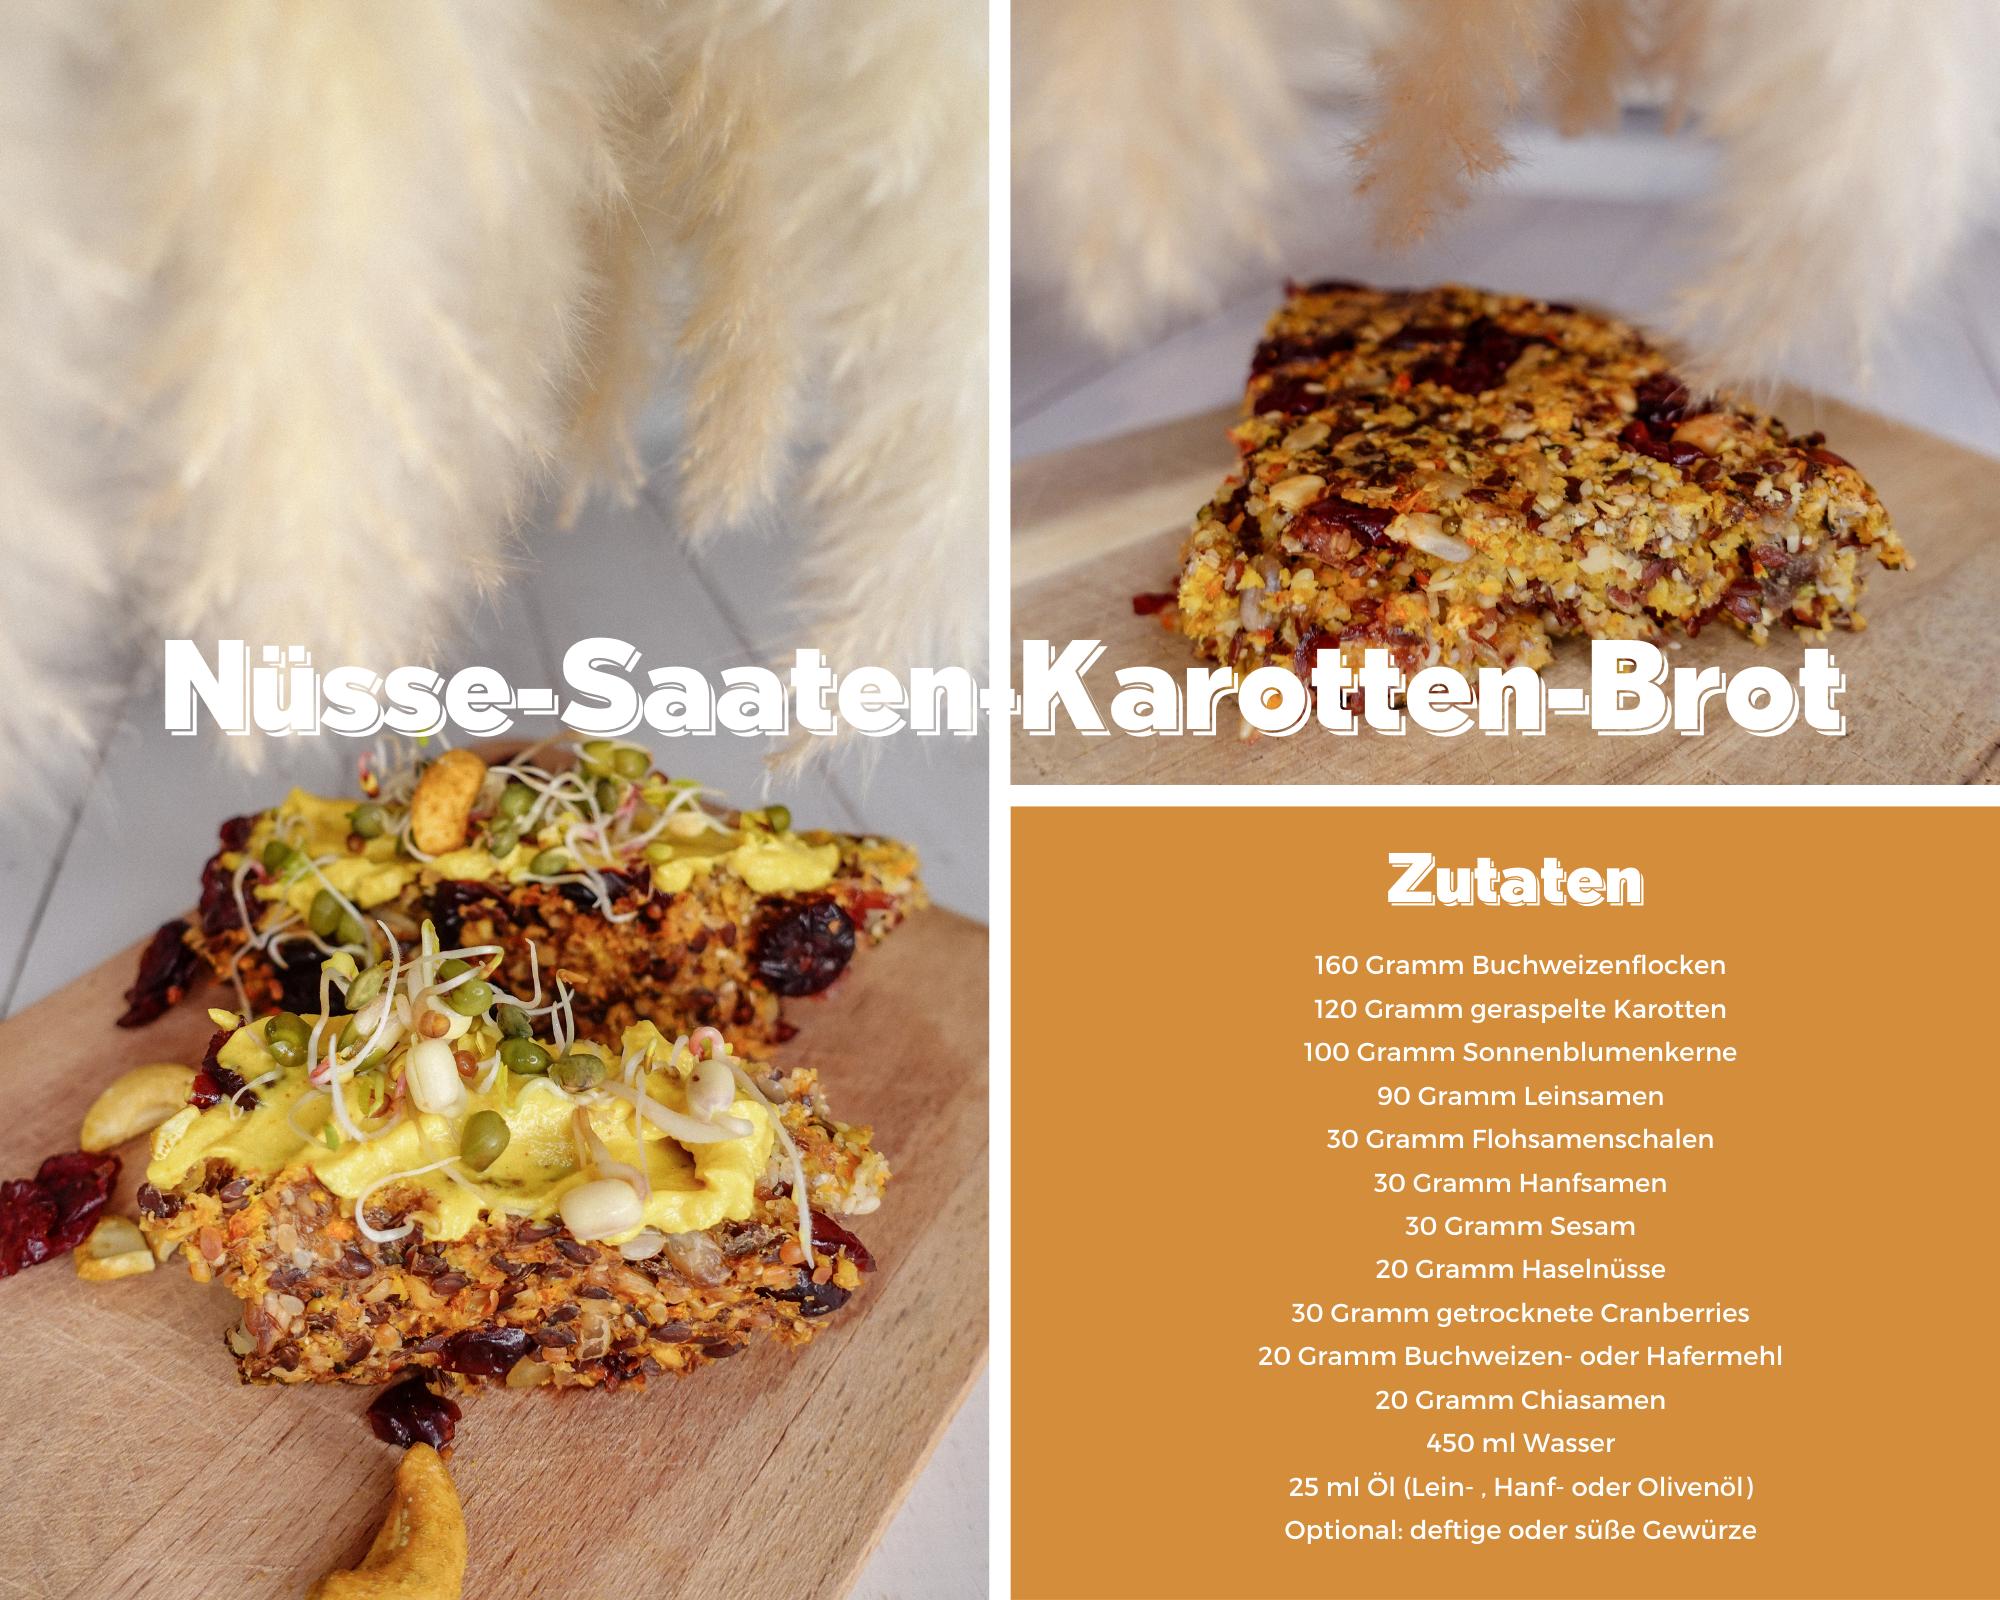 saatenbrot-nüssebrot-wunderbrot-basisches brot-basische ernährung-gesunde ernährung-health-karottenbrot-lowcarb brot-rezept